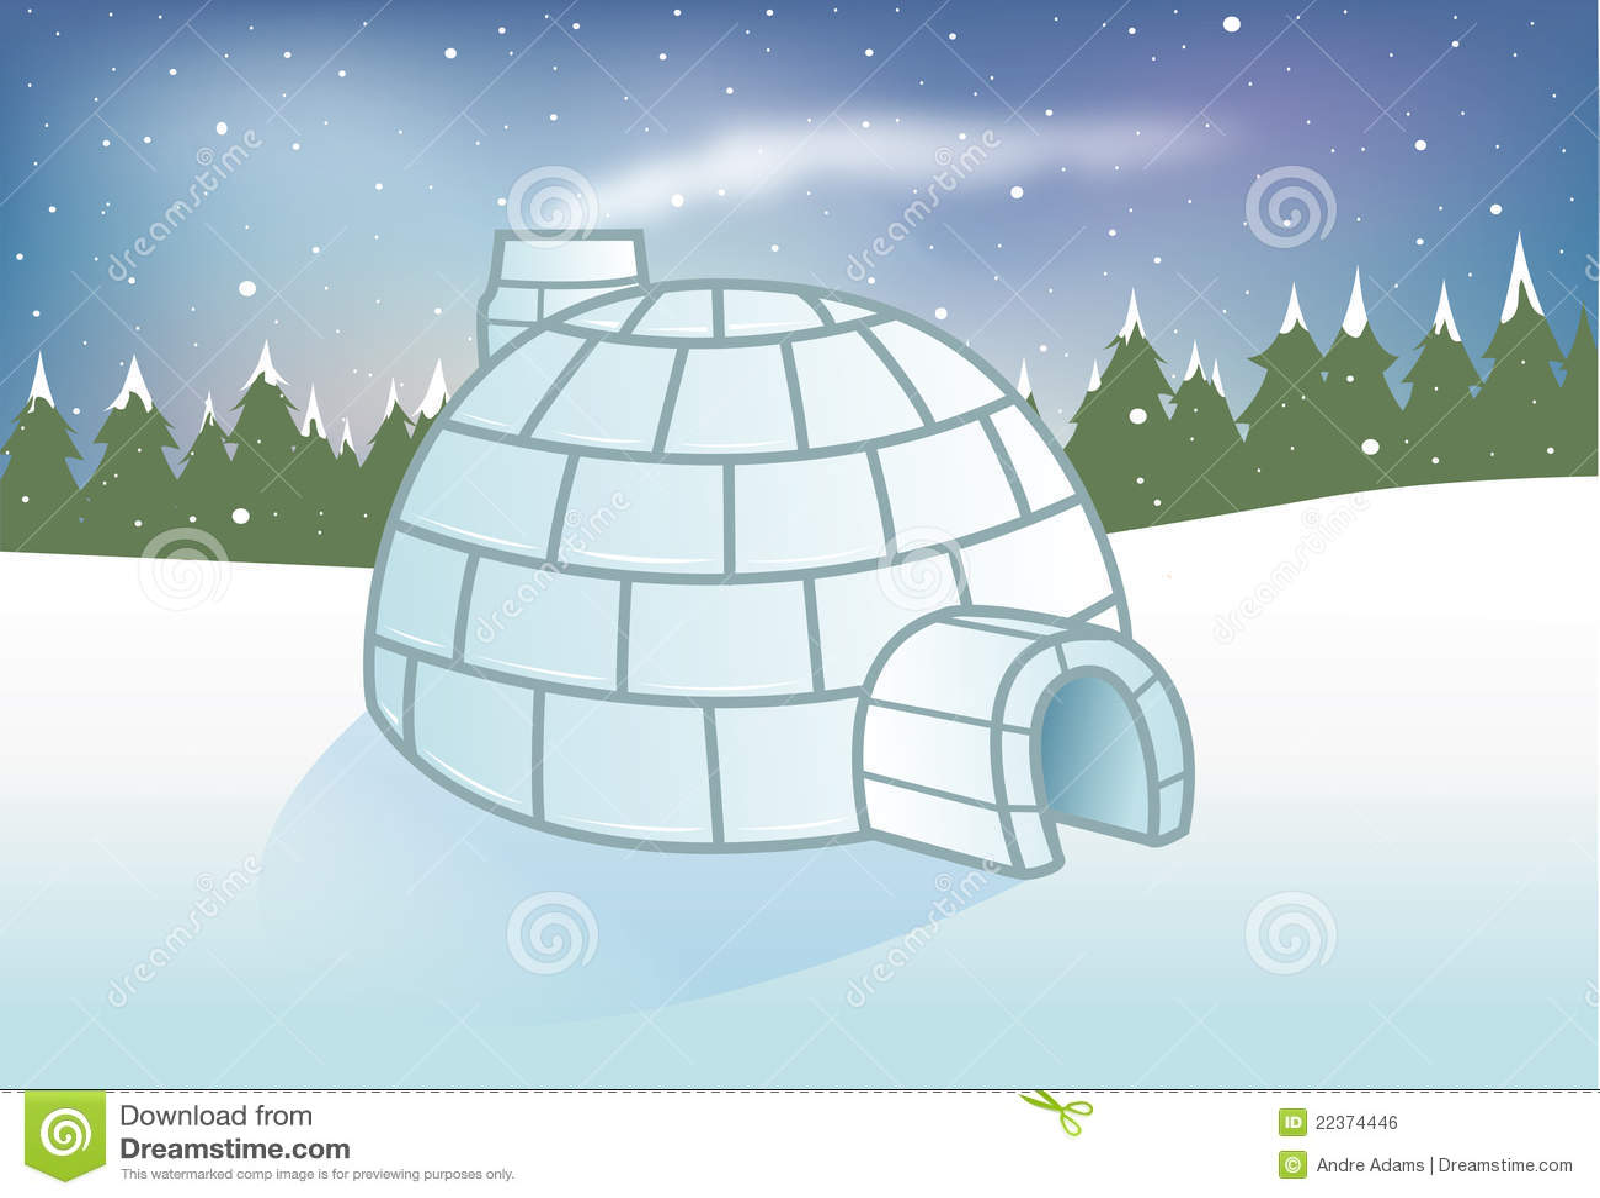 igloo snowy background 22374446